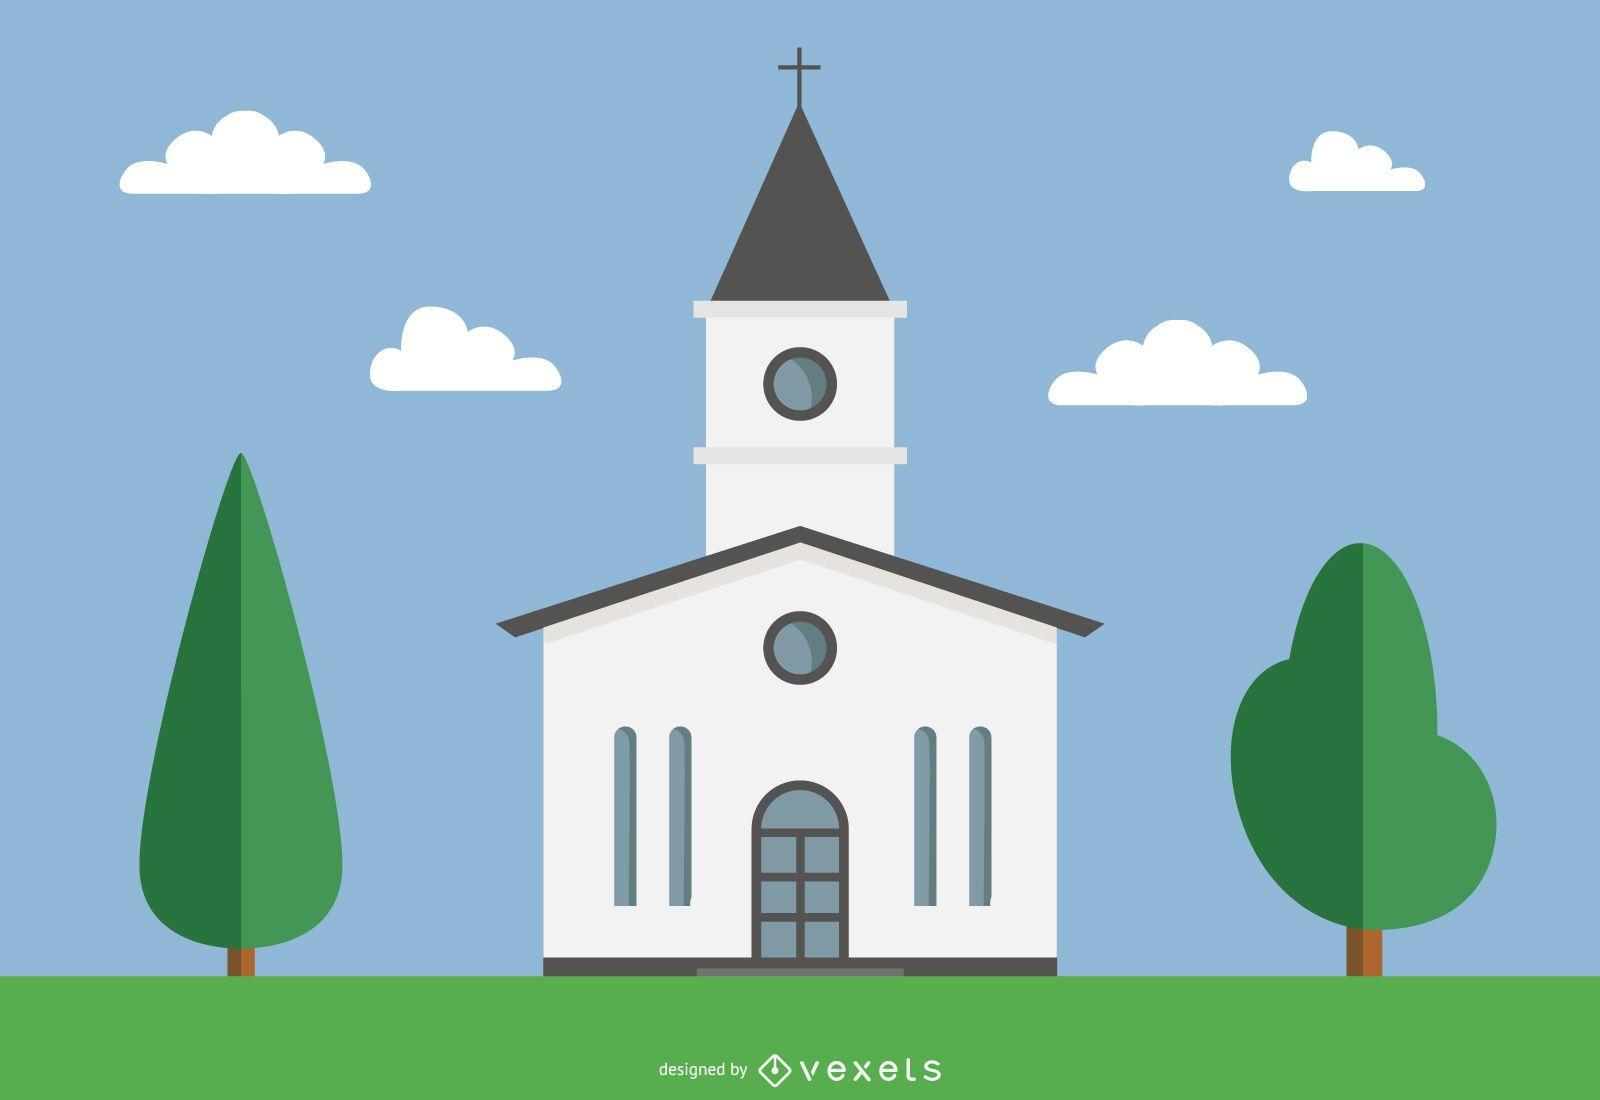 Funky Minimal Village Church